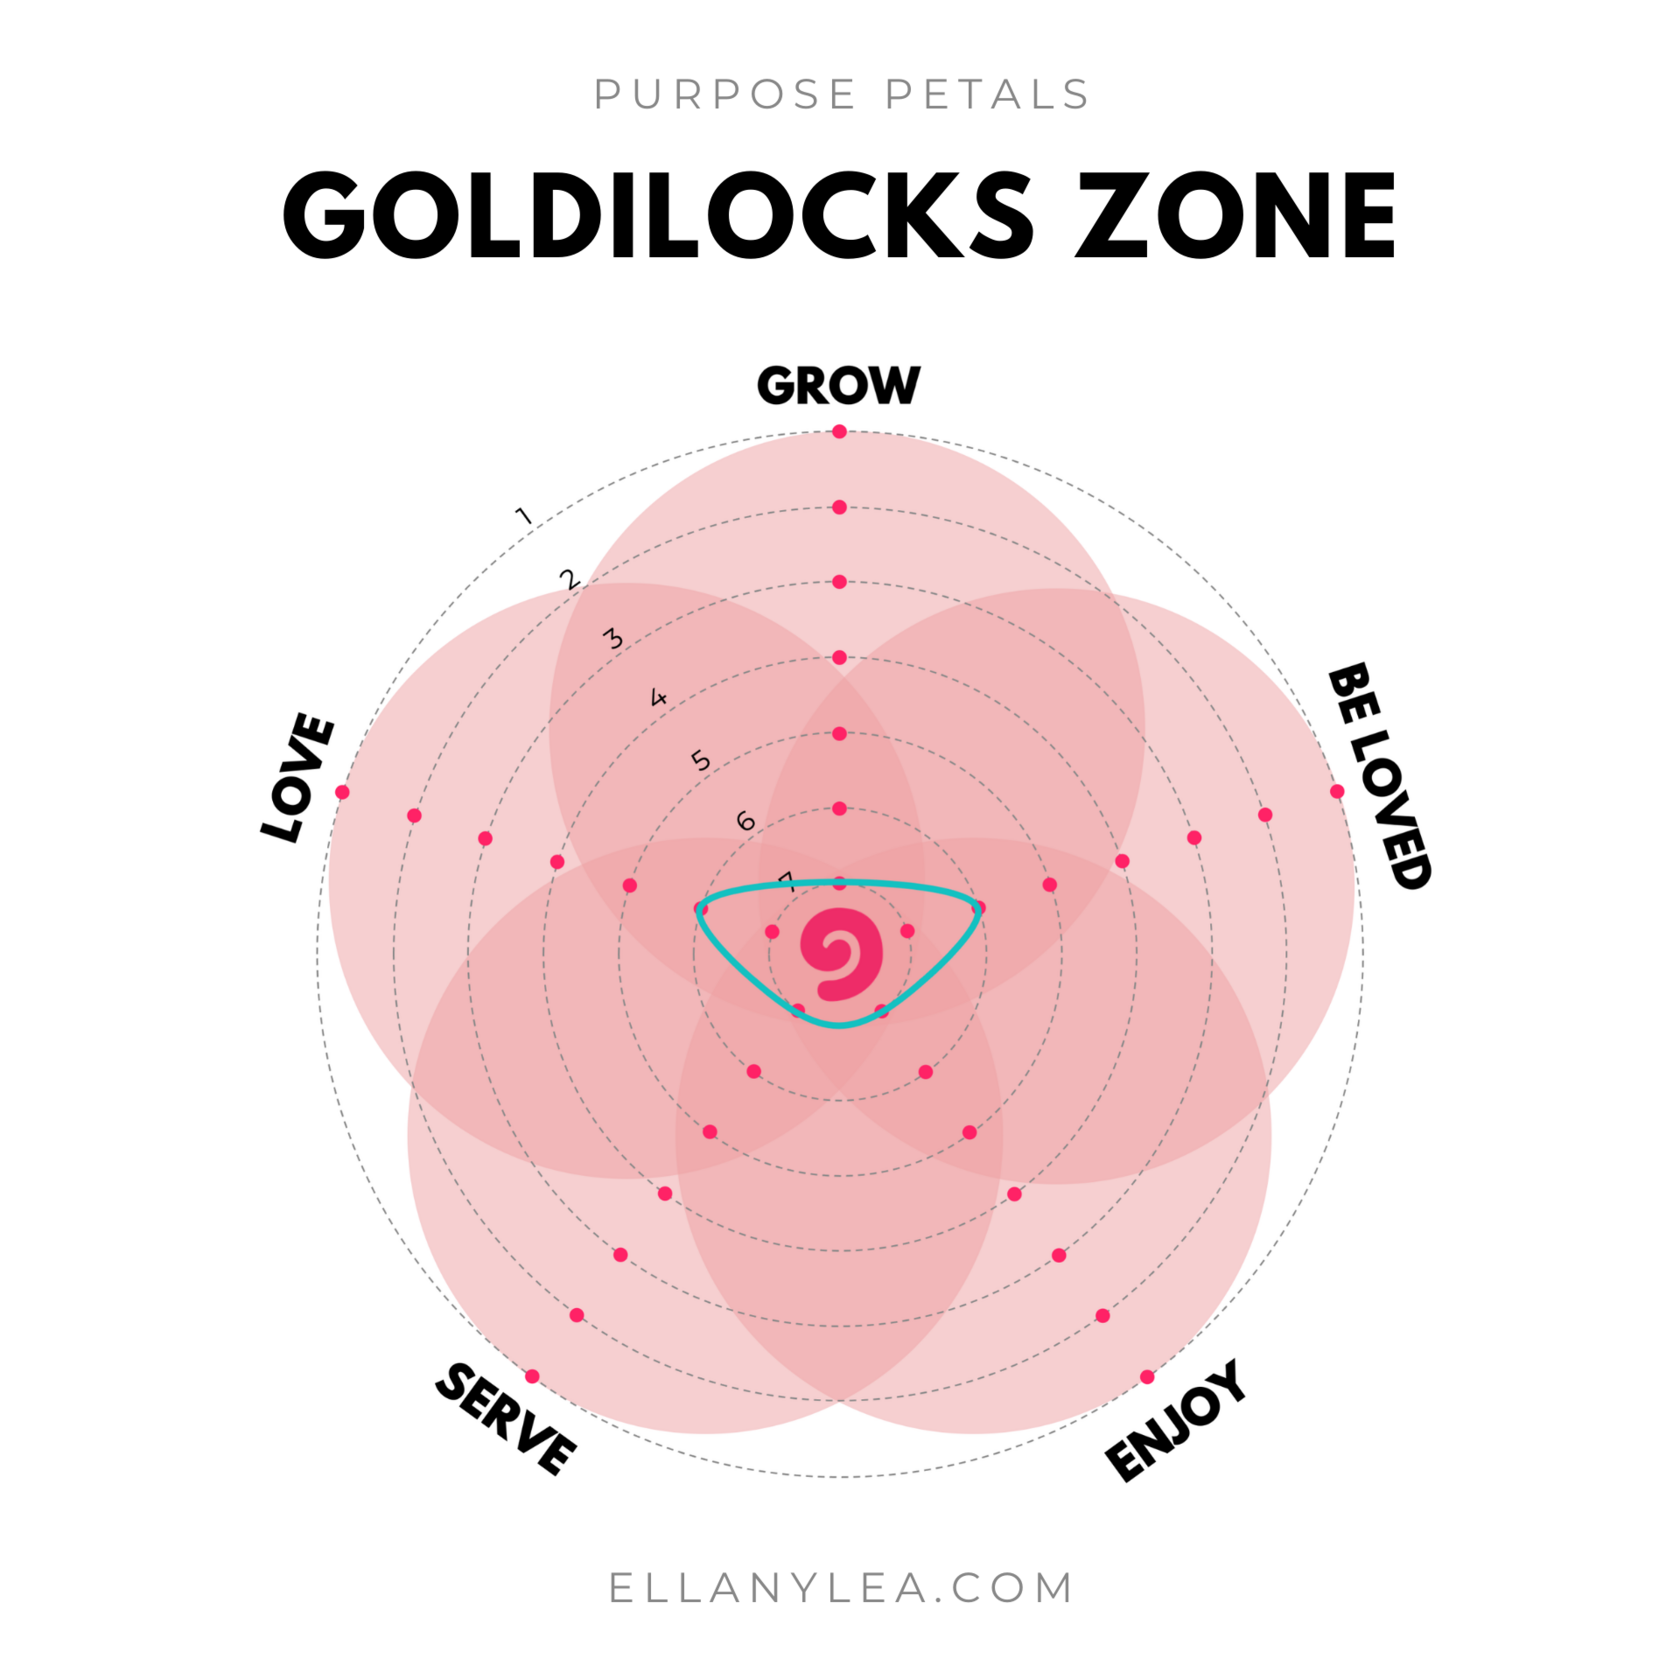 EL - Five Purpose Petals - Goldilocks Zone